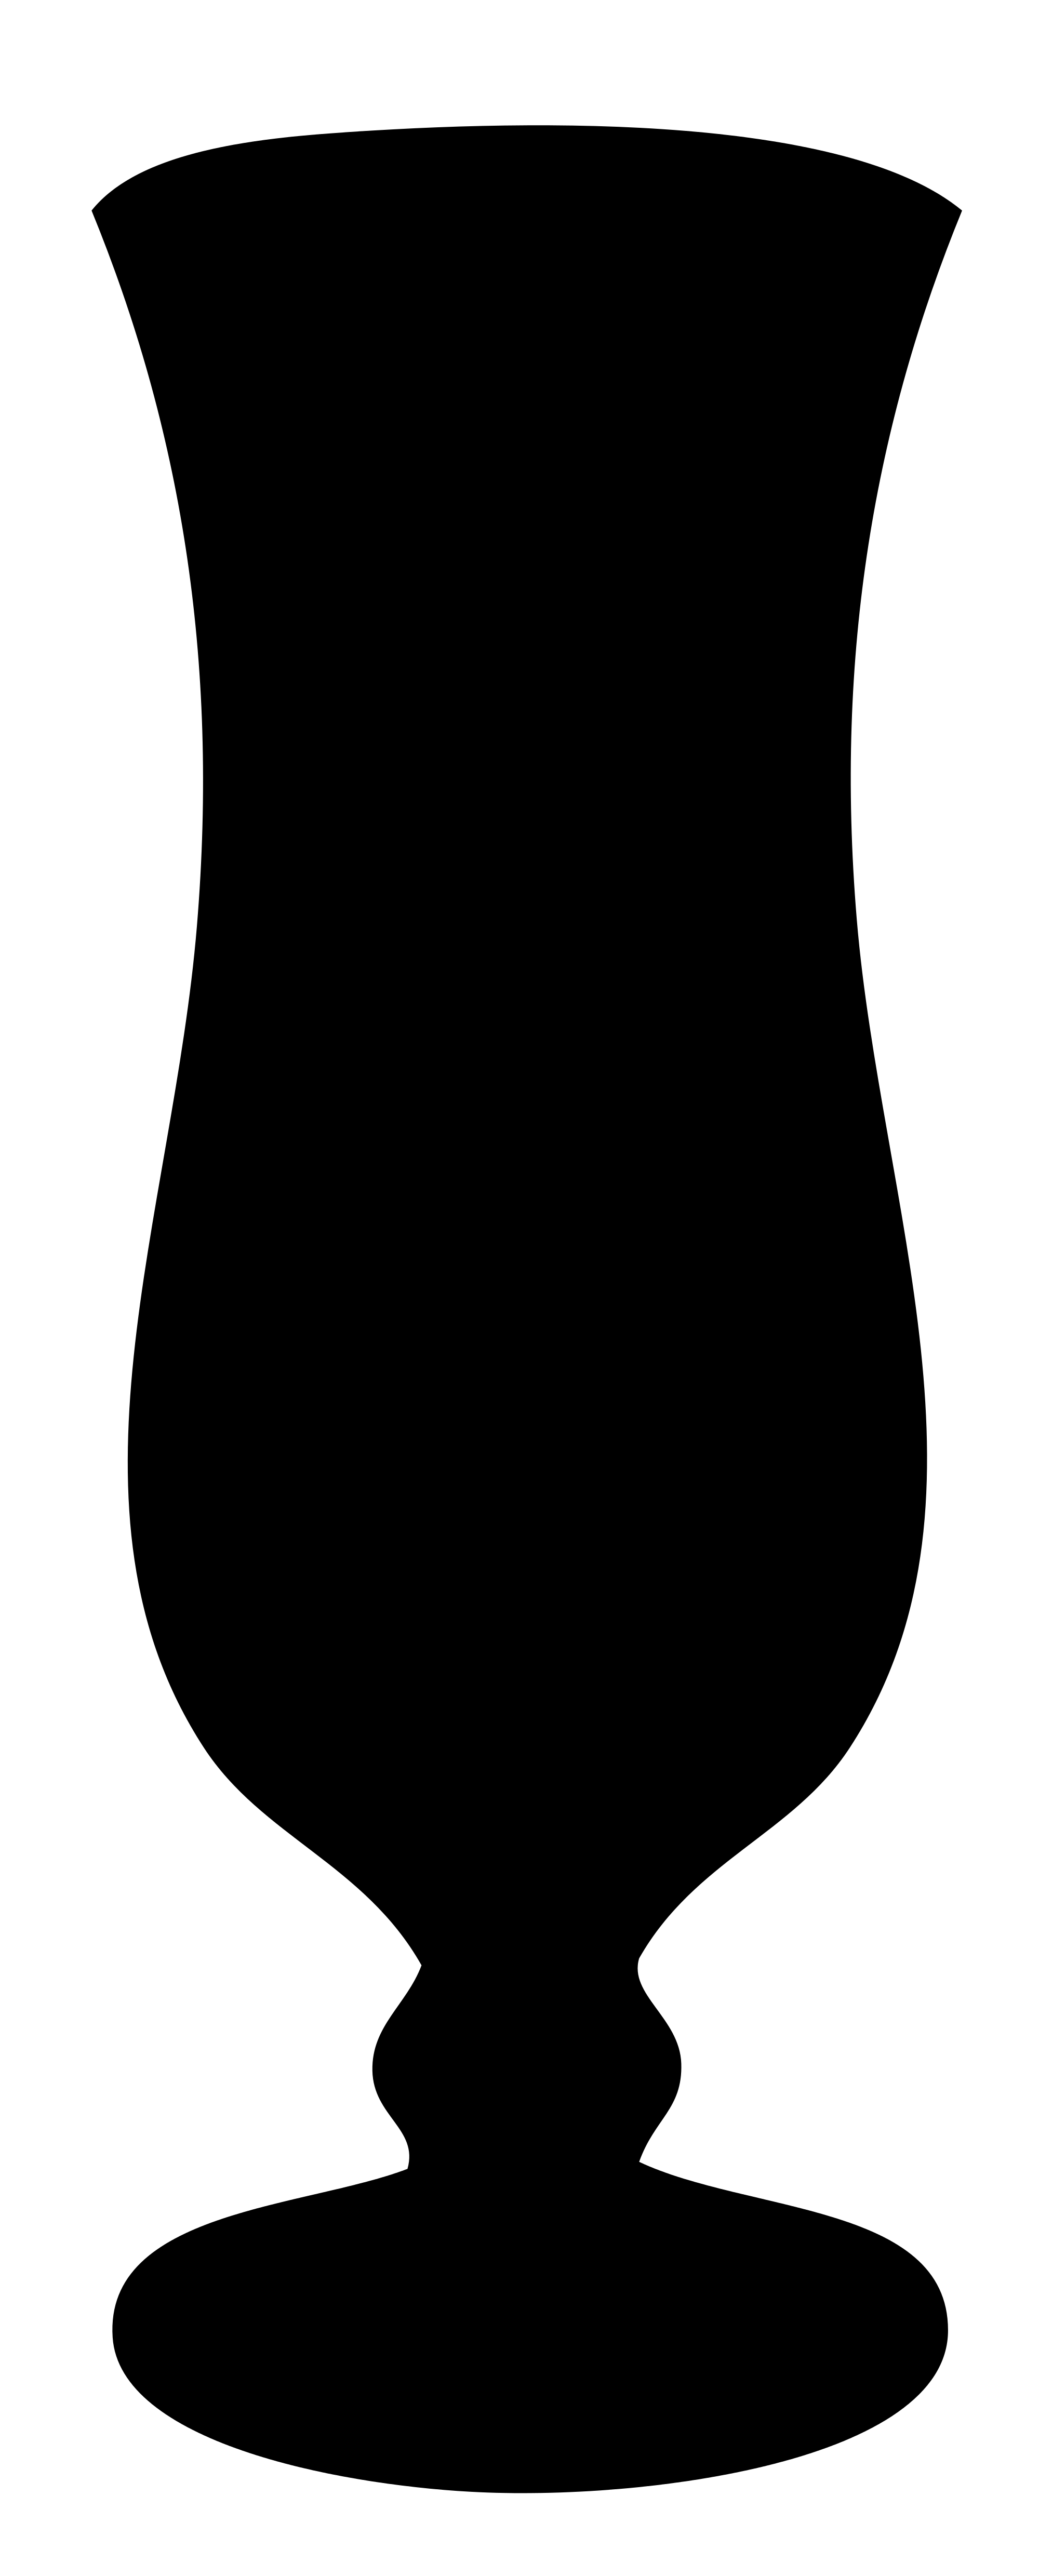 2000x4959 Filehurricane Glass Silhouette.svg